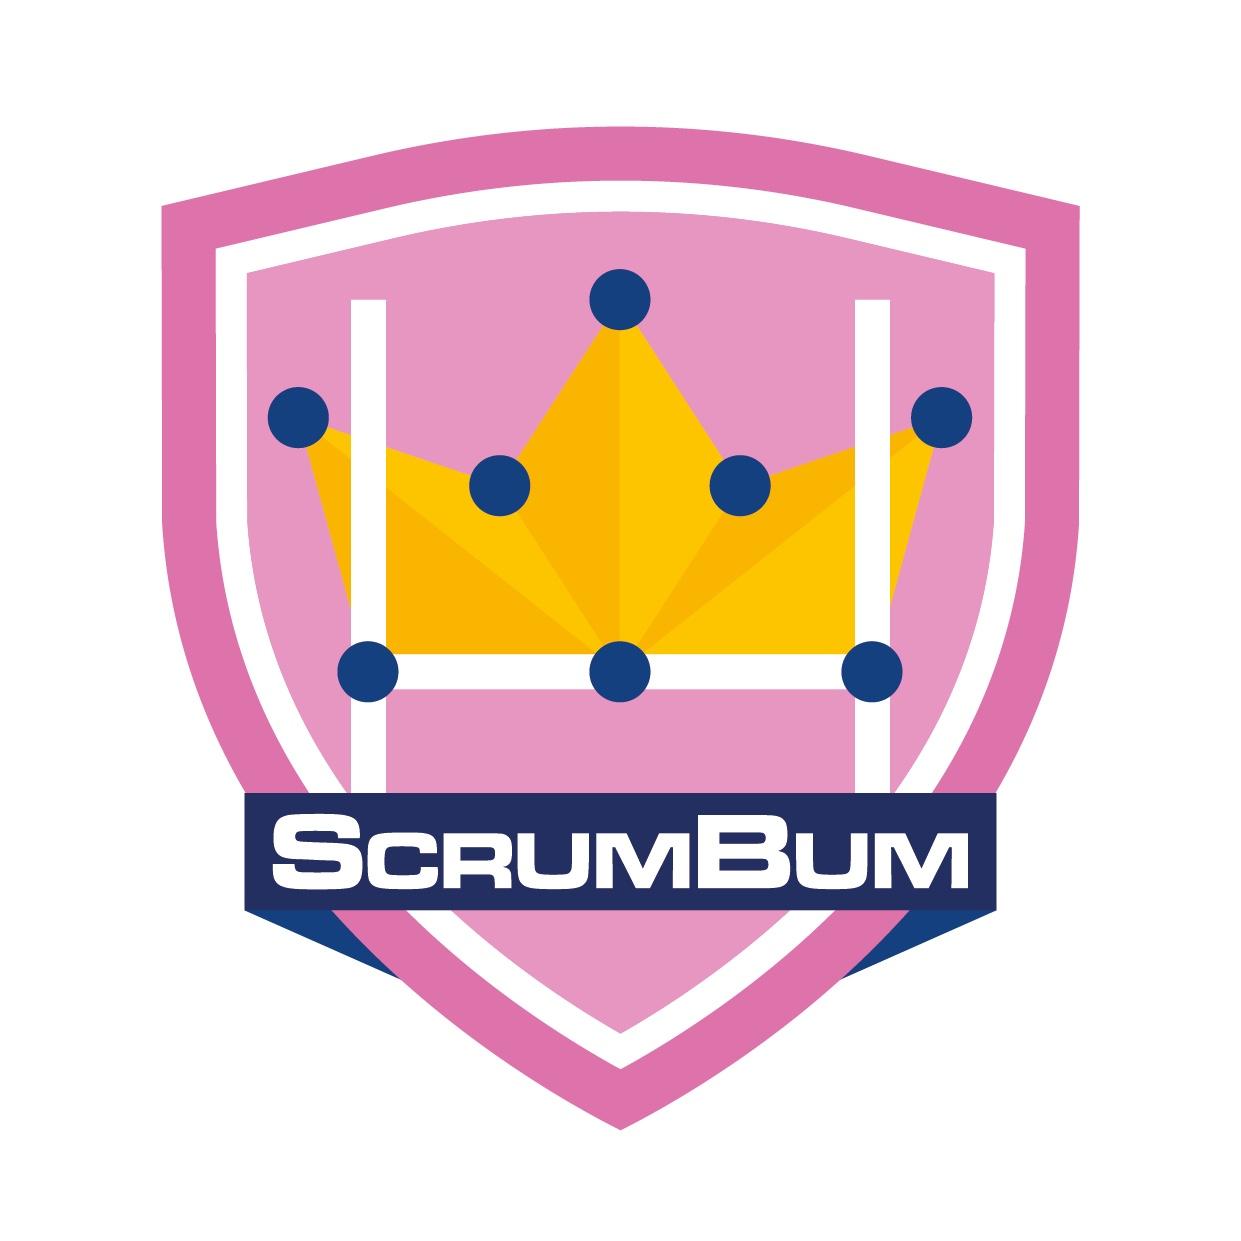 ScrumBum_Social_Logo_Images_v1.0-03.jpg